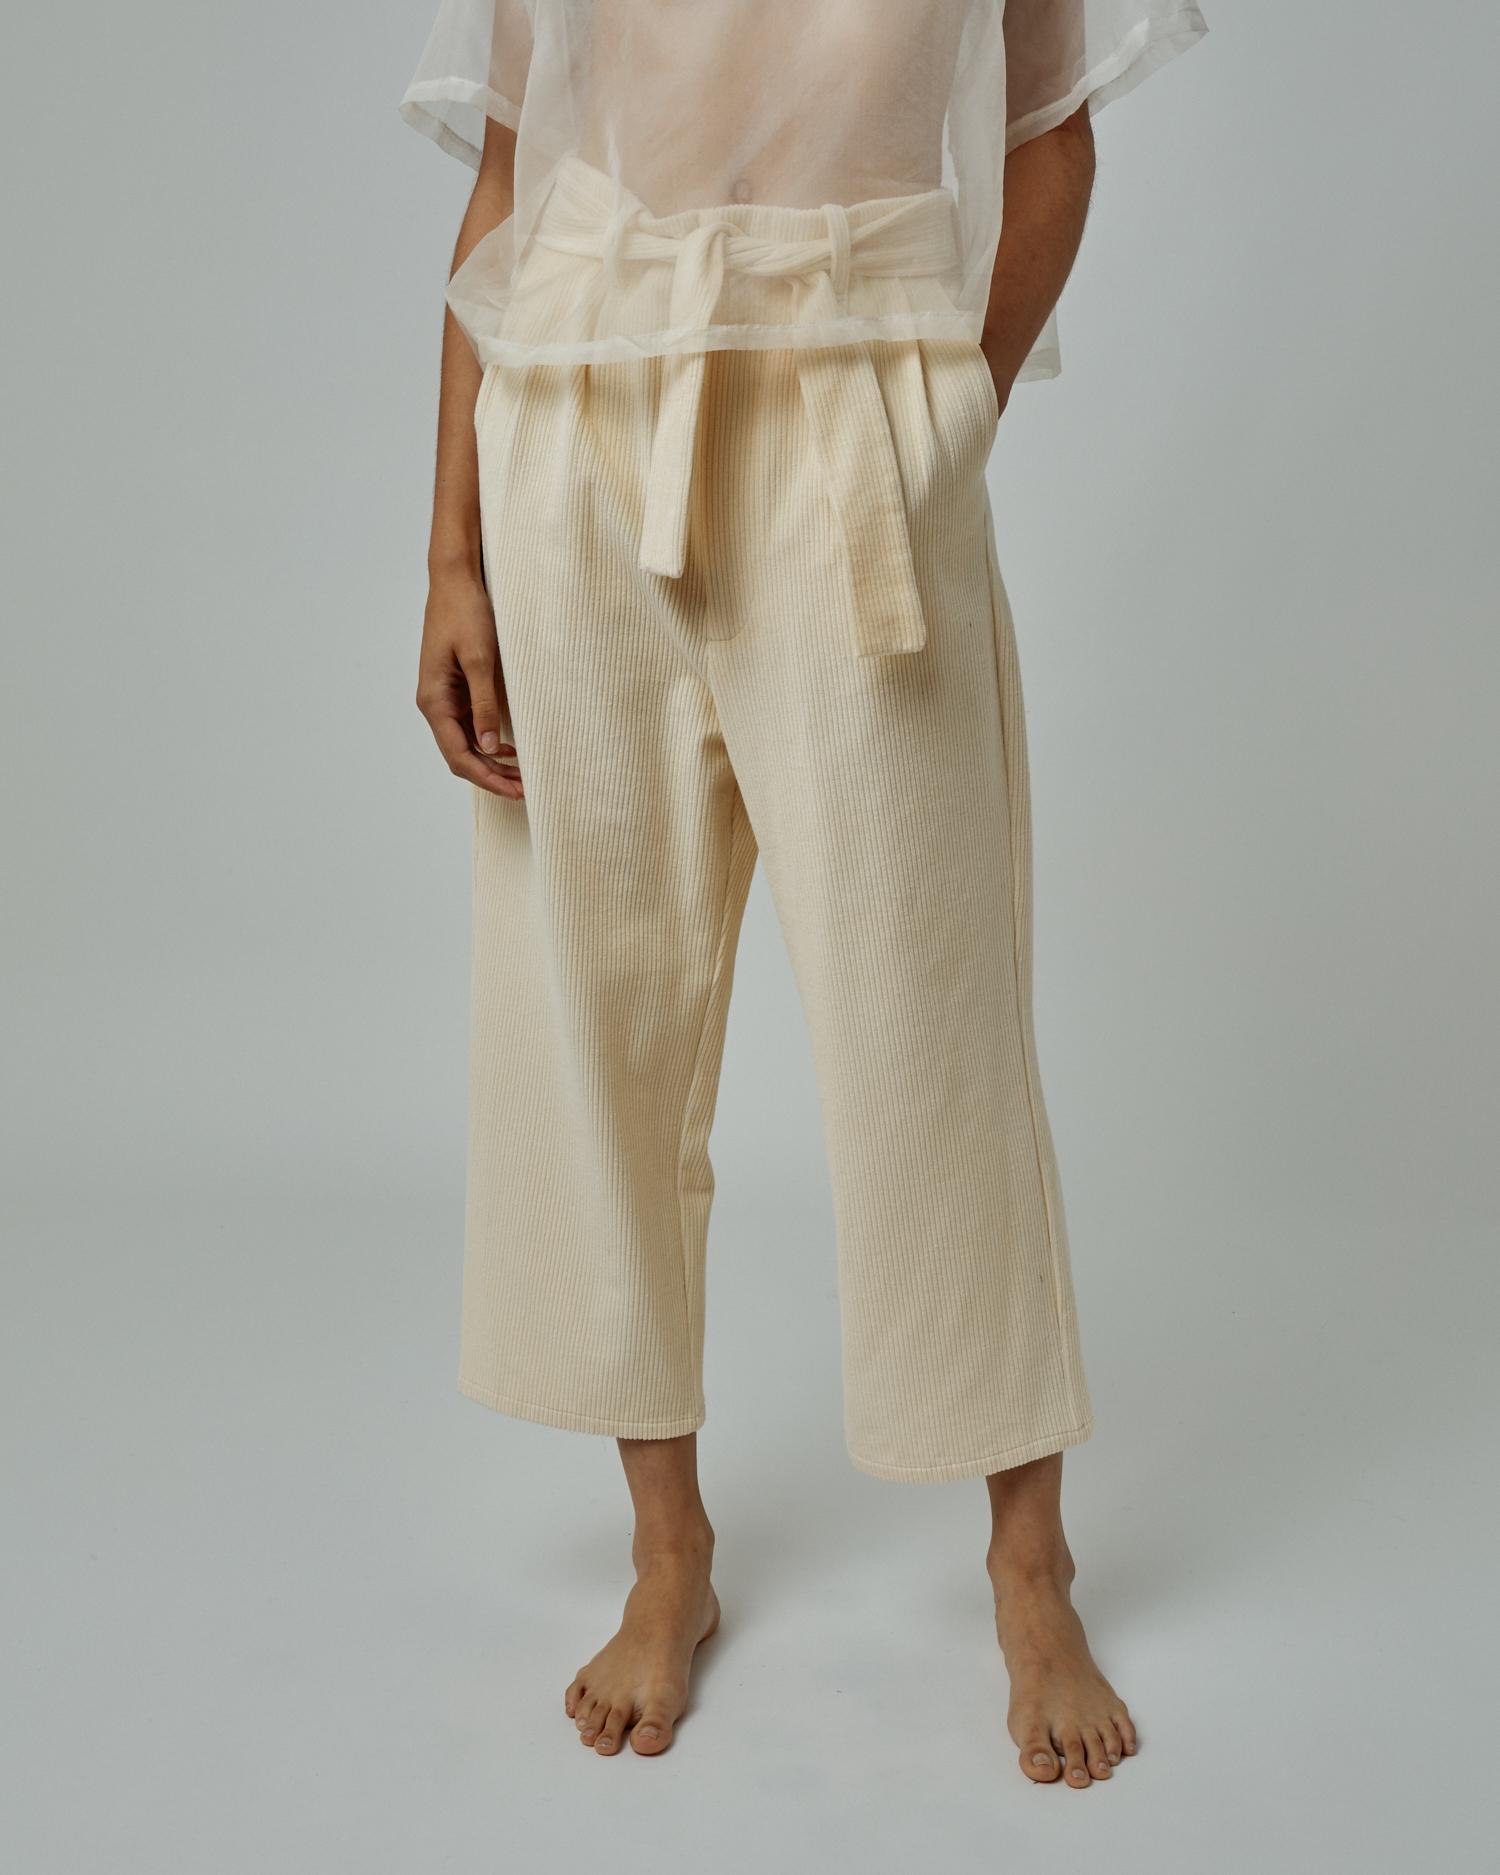 Shop Gender Neutral Wide Leg Pant In Corduroy